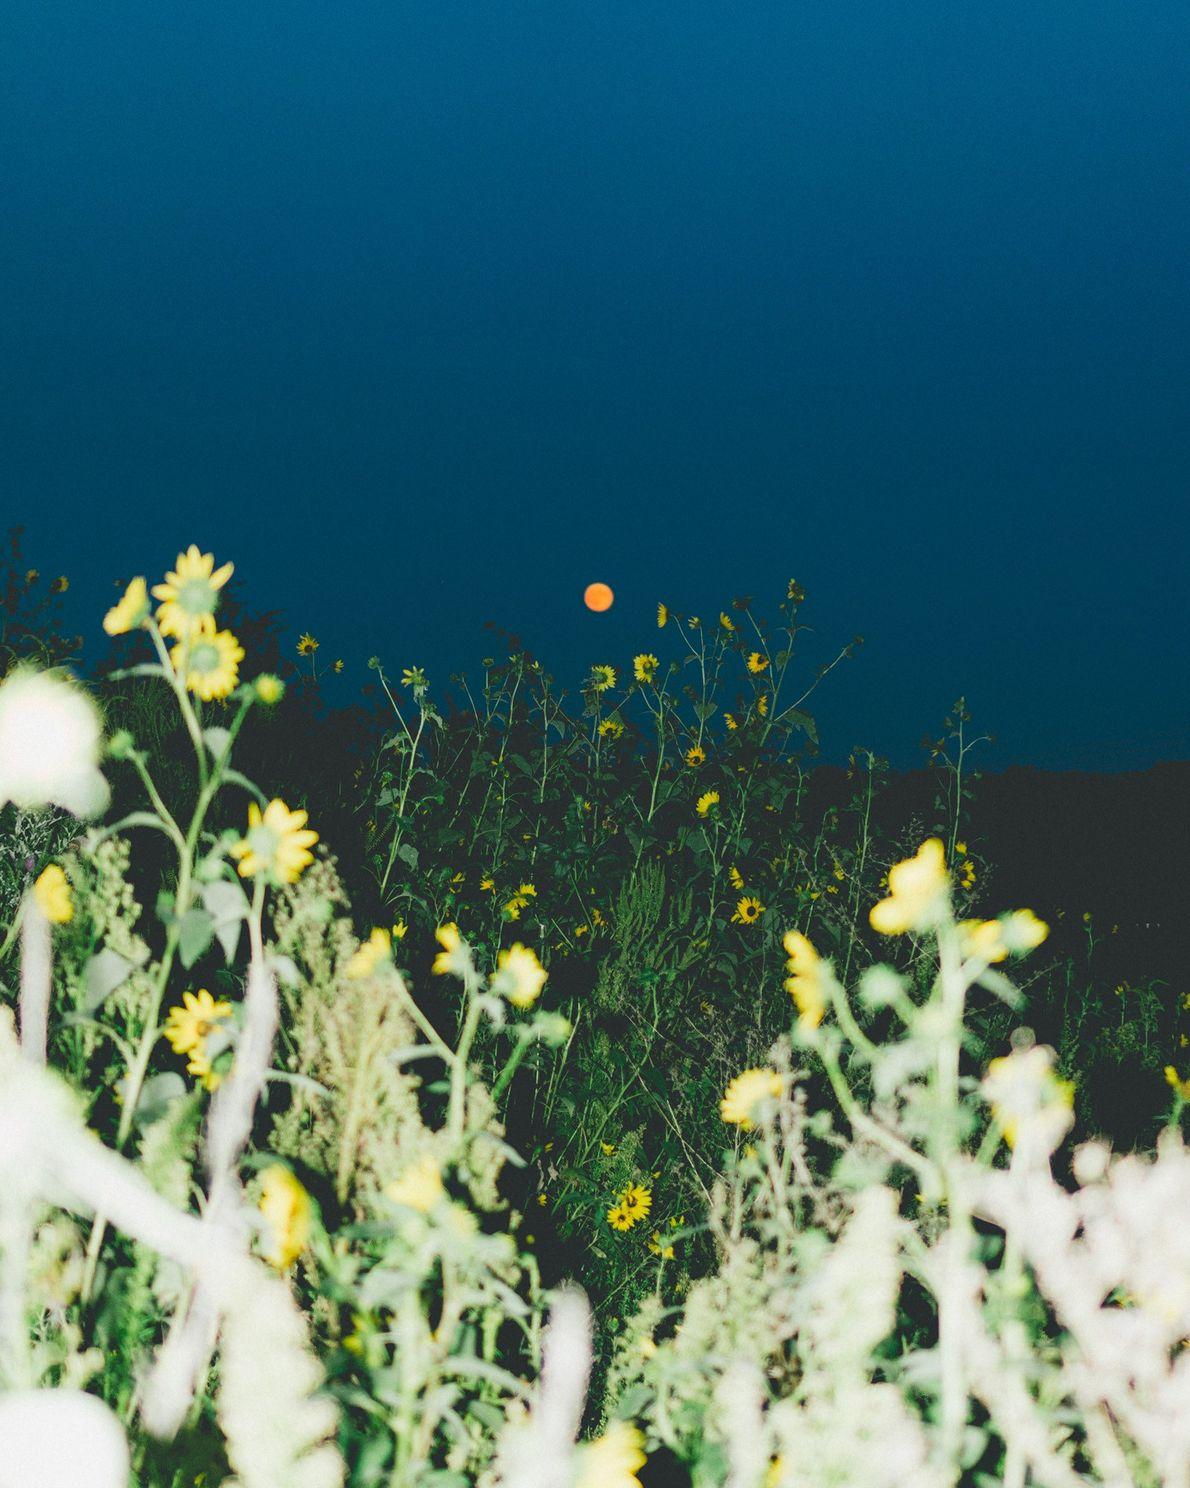 La pleine lune illumine un champ de tournesols en bordure de Lincoln.